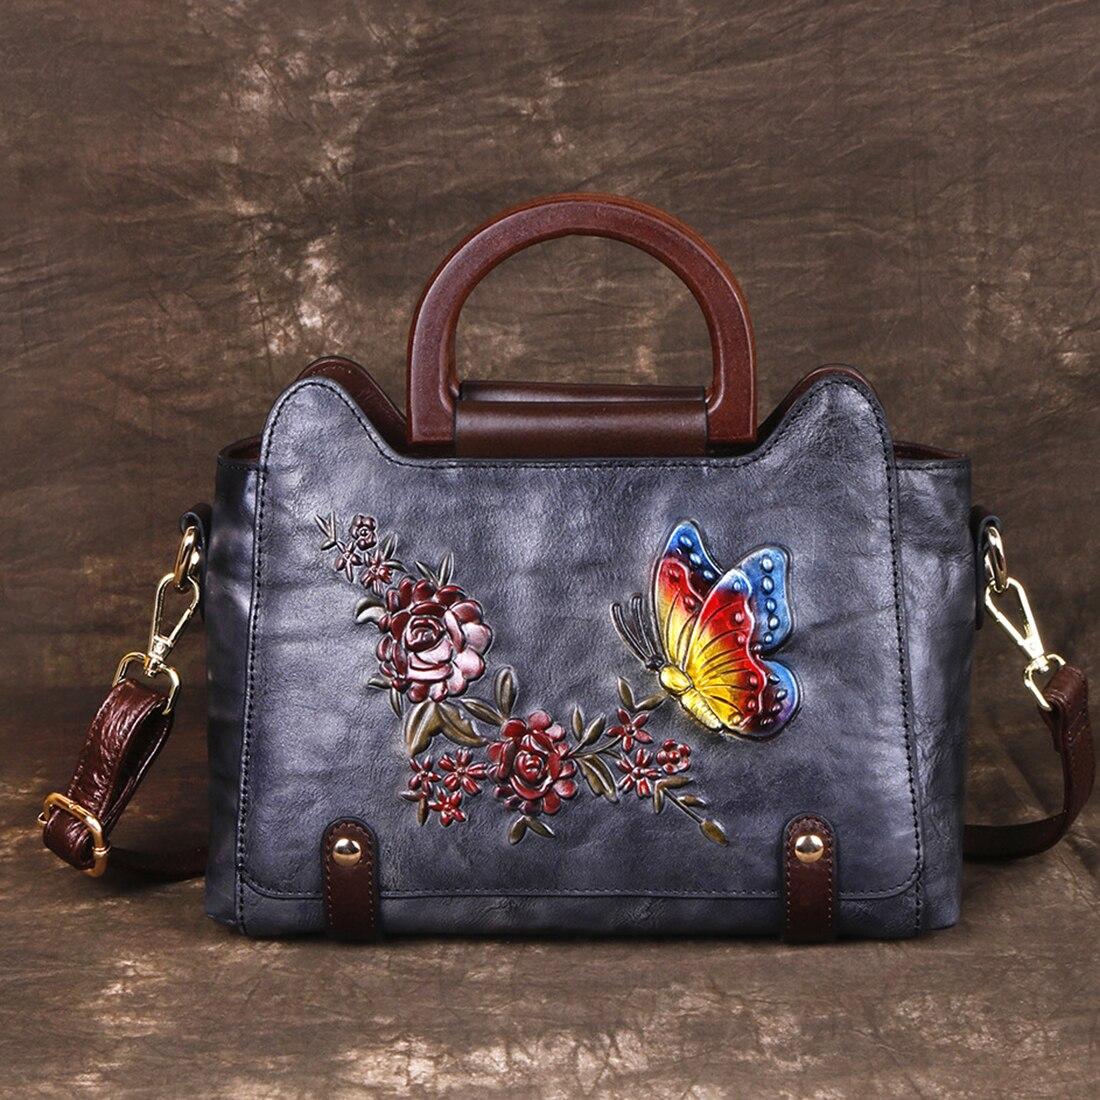 Retro Women Messenger Cross Body Bag Embossed Floral Tote Bags High Quality Female Handbag Genuine Leather Shoulder Bags